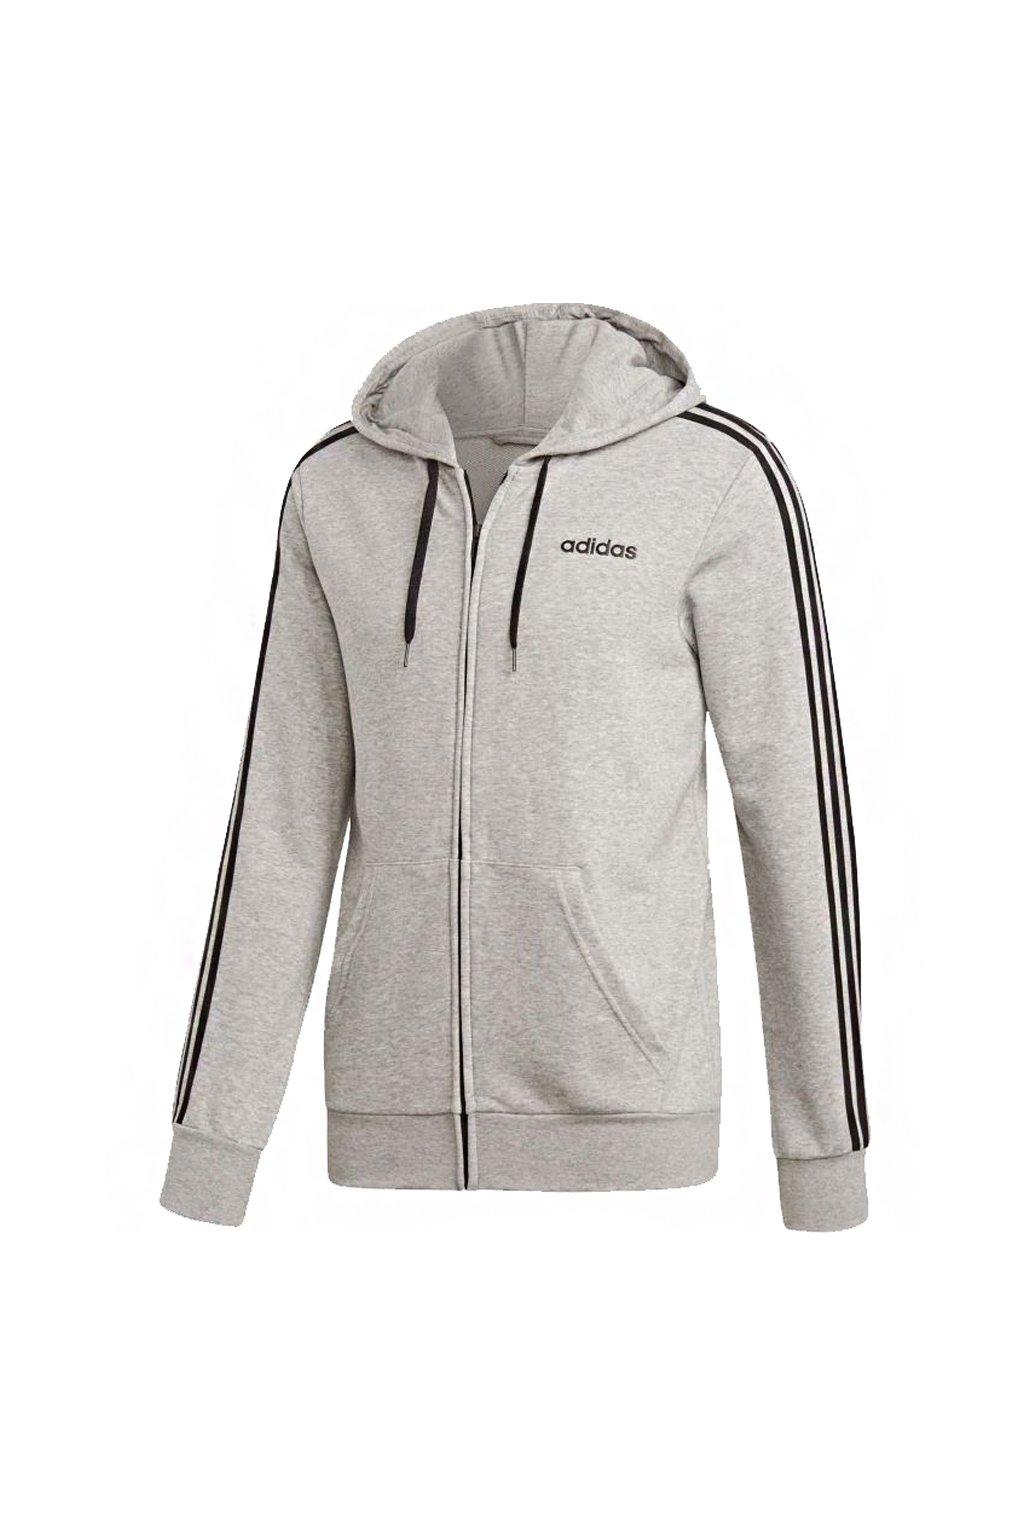 Pánska mikina Adidas Essentials 3 Stripes Fullzip sivá DU0473